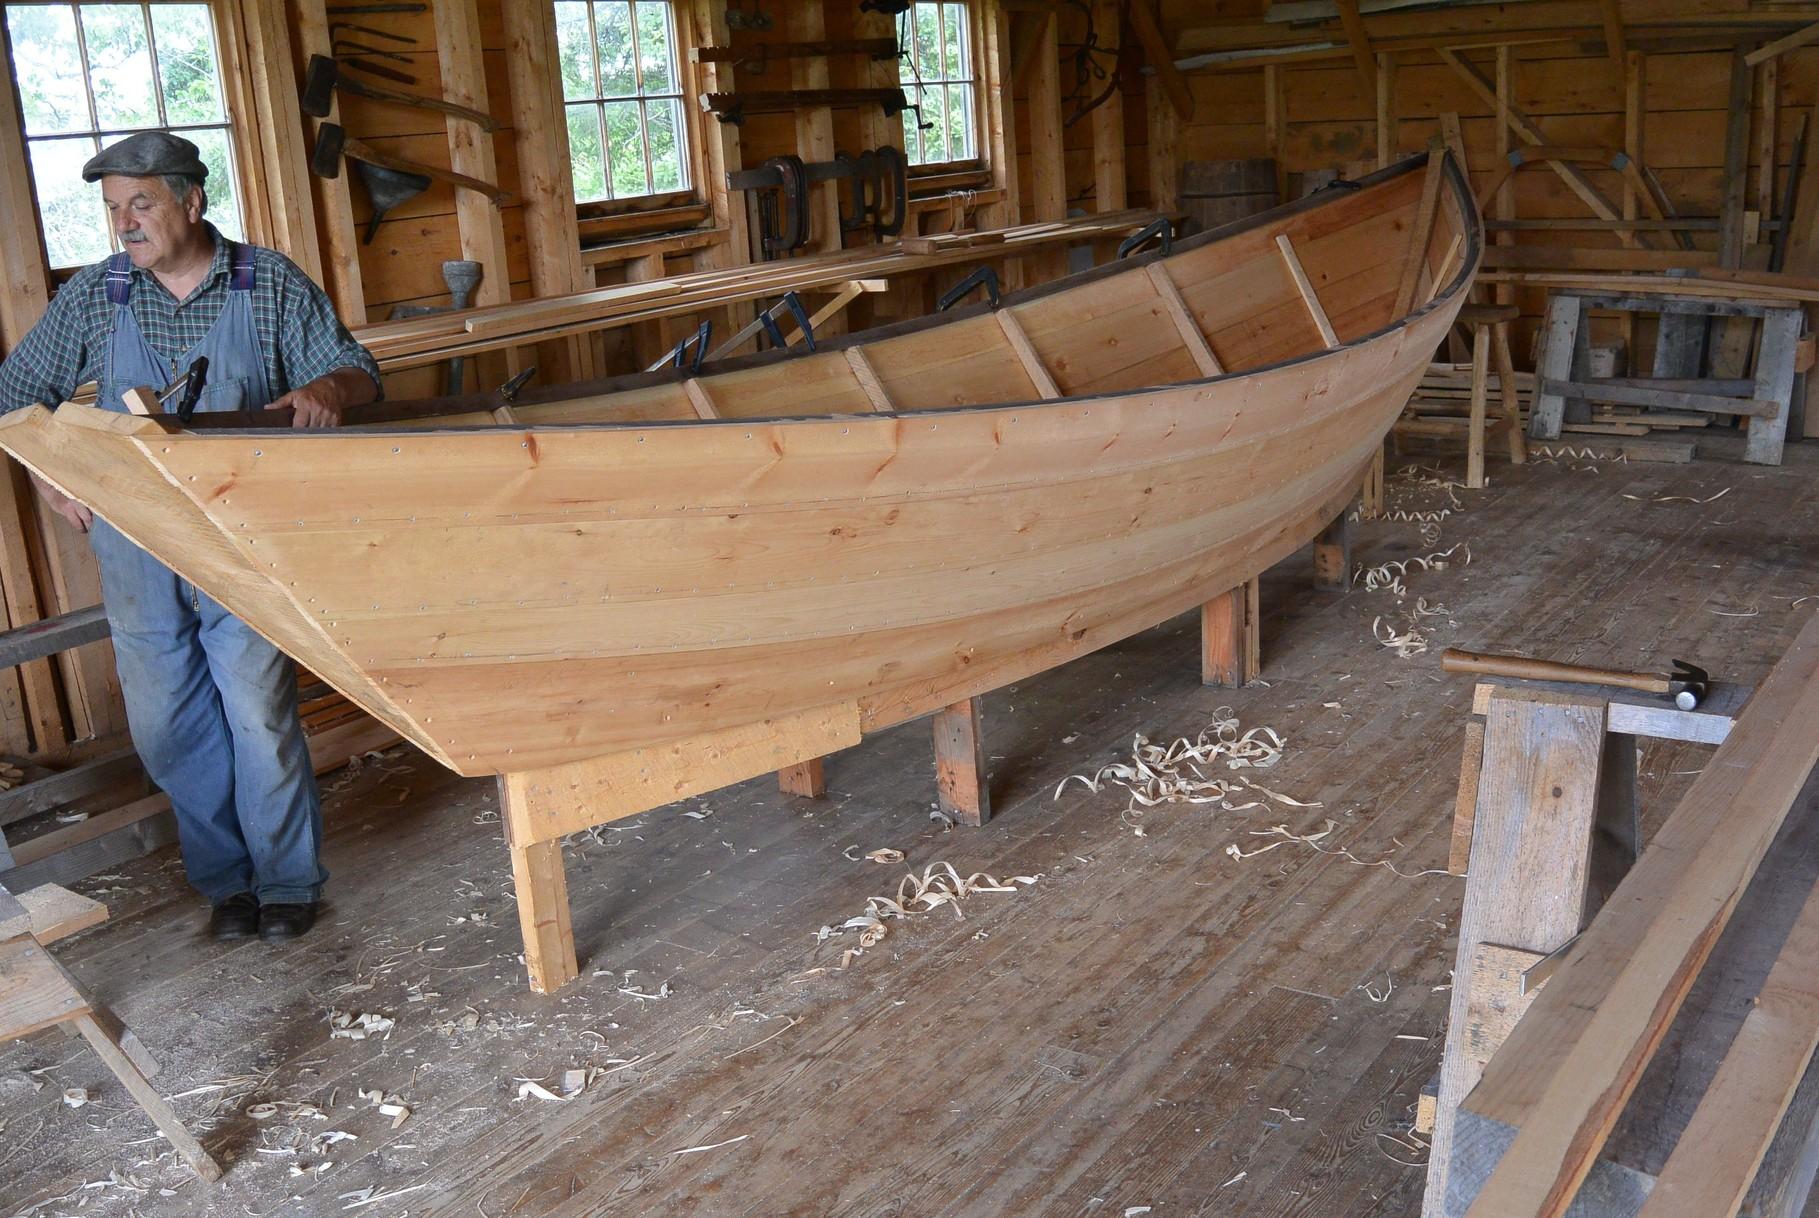 fabrication de bateau de pêche